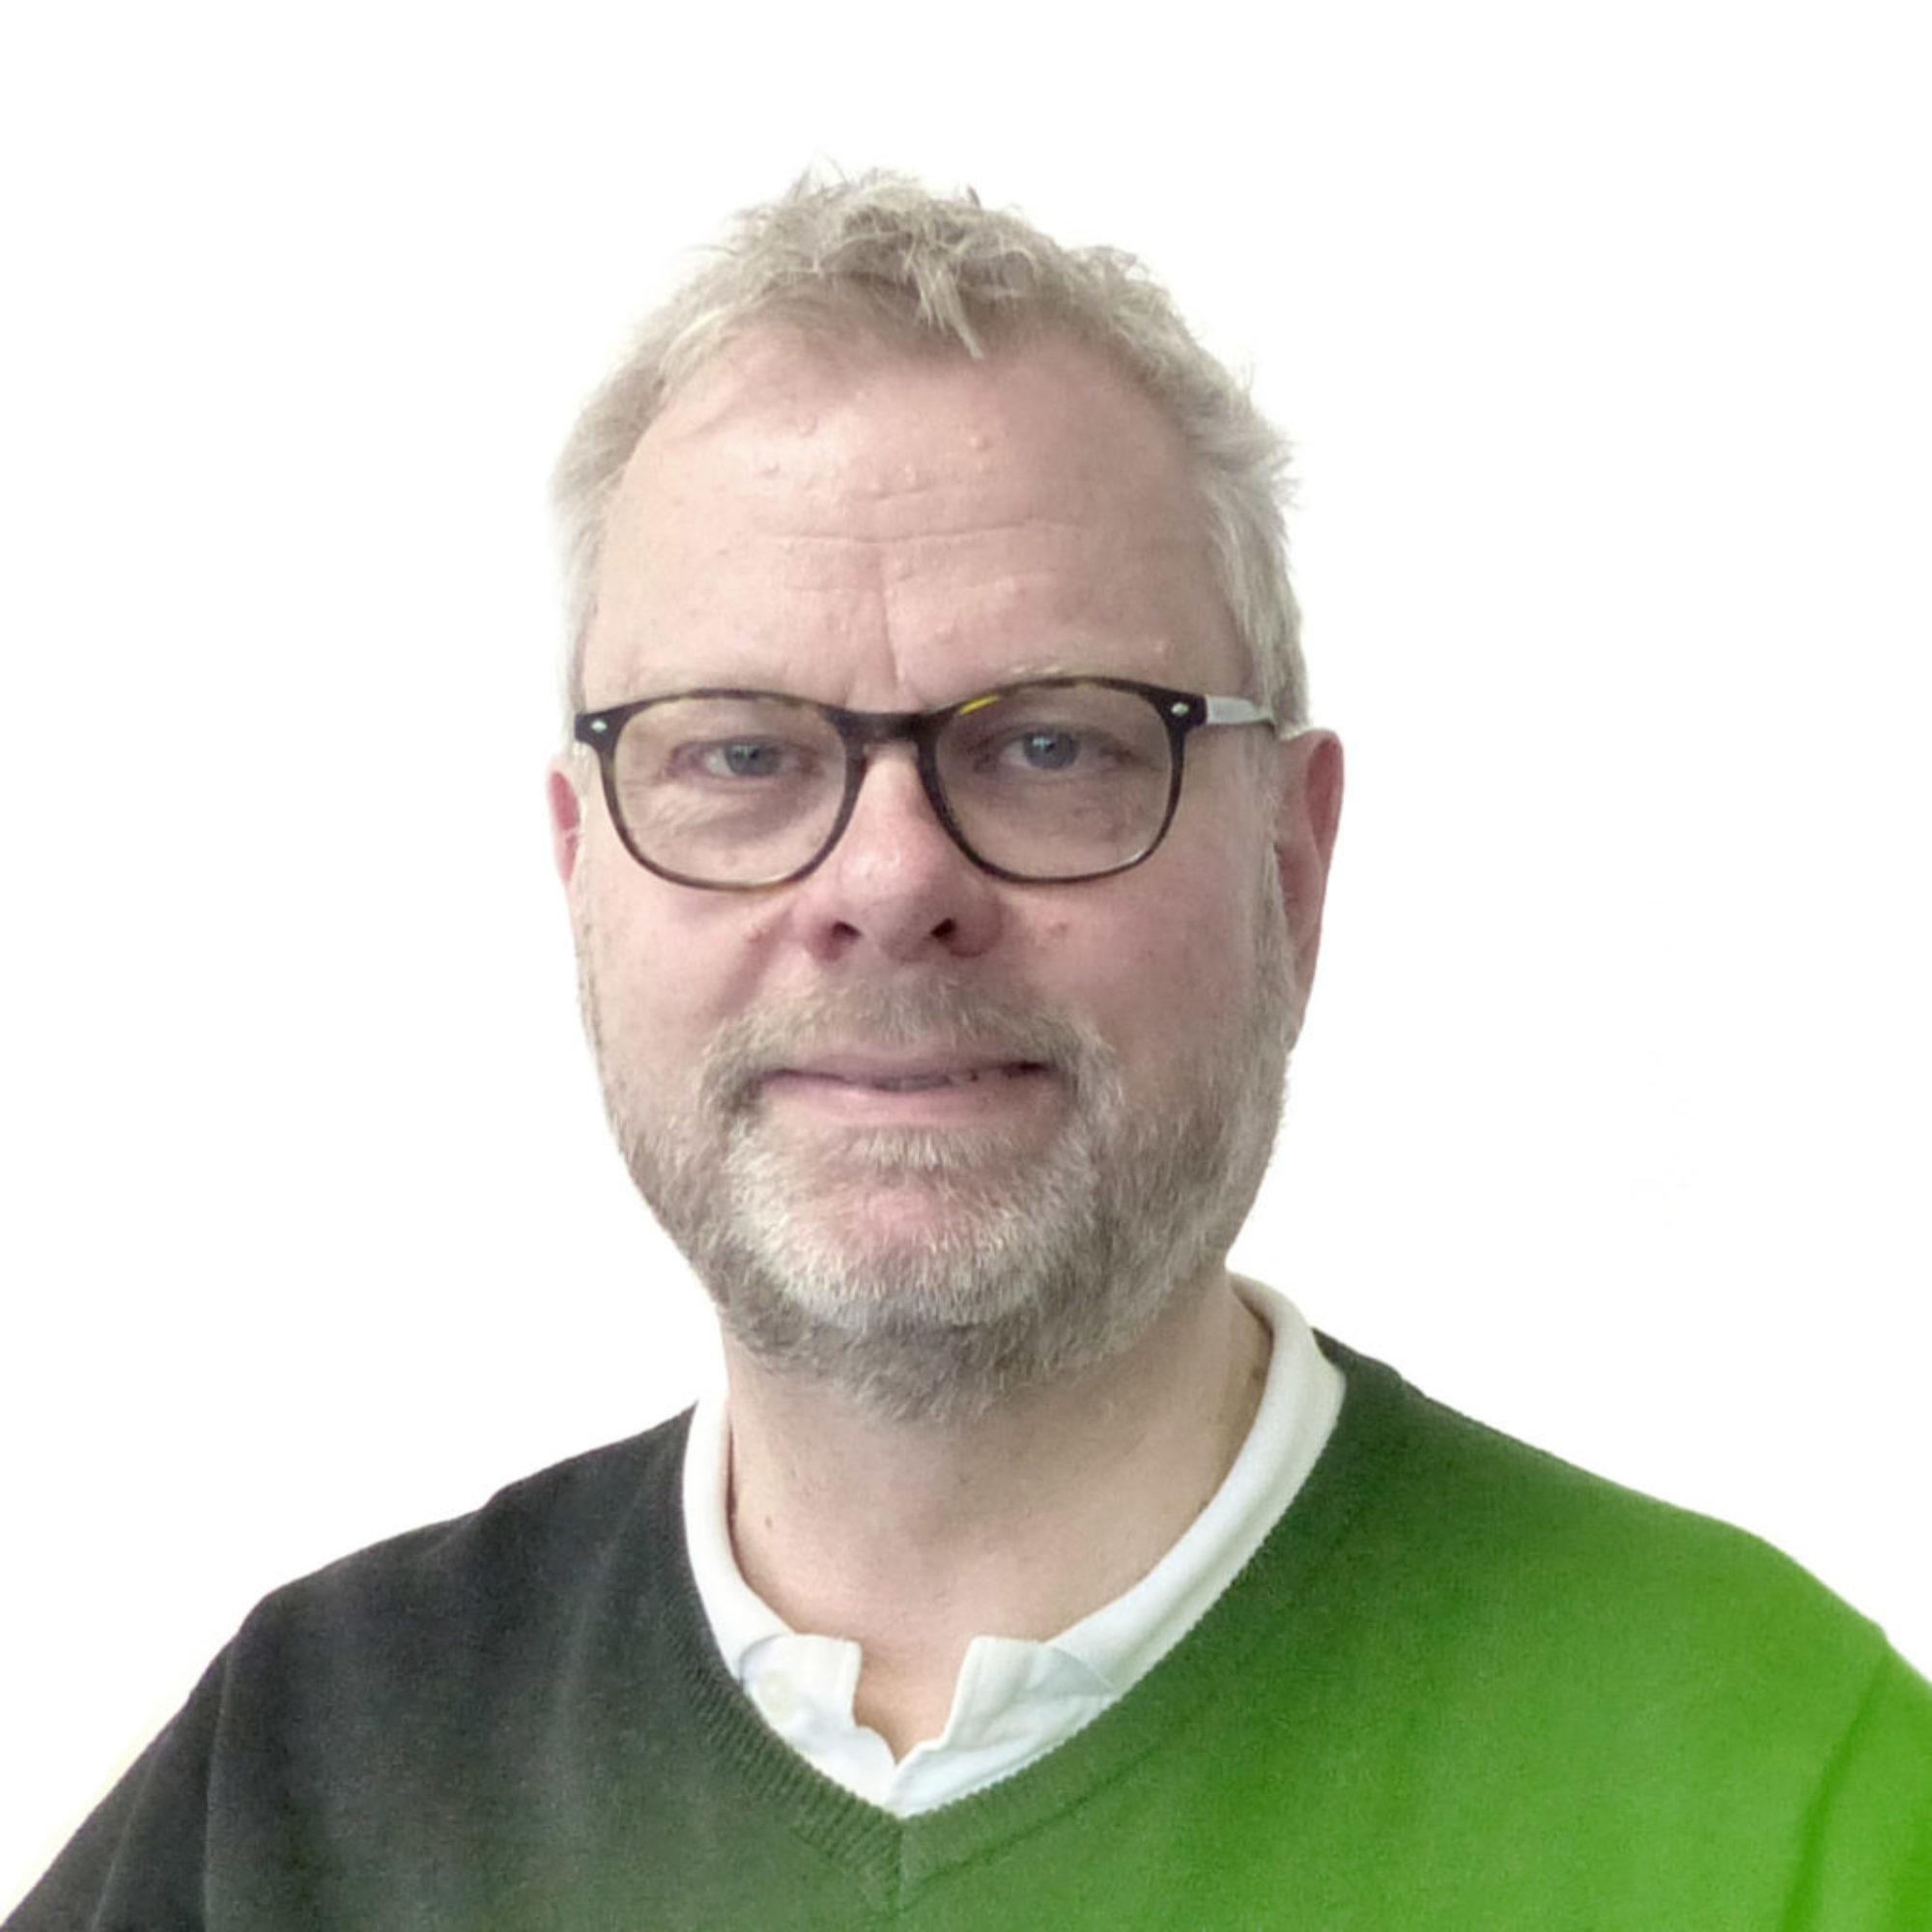 Lars-Henrik Pamp